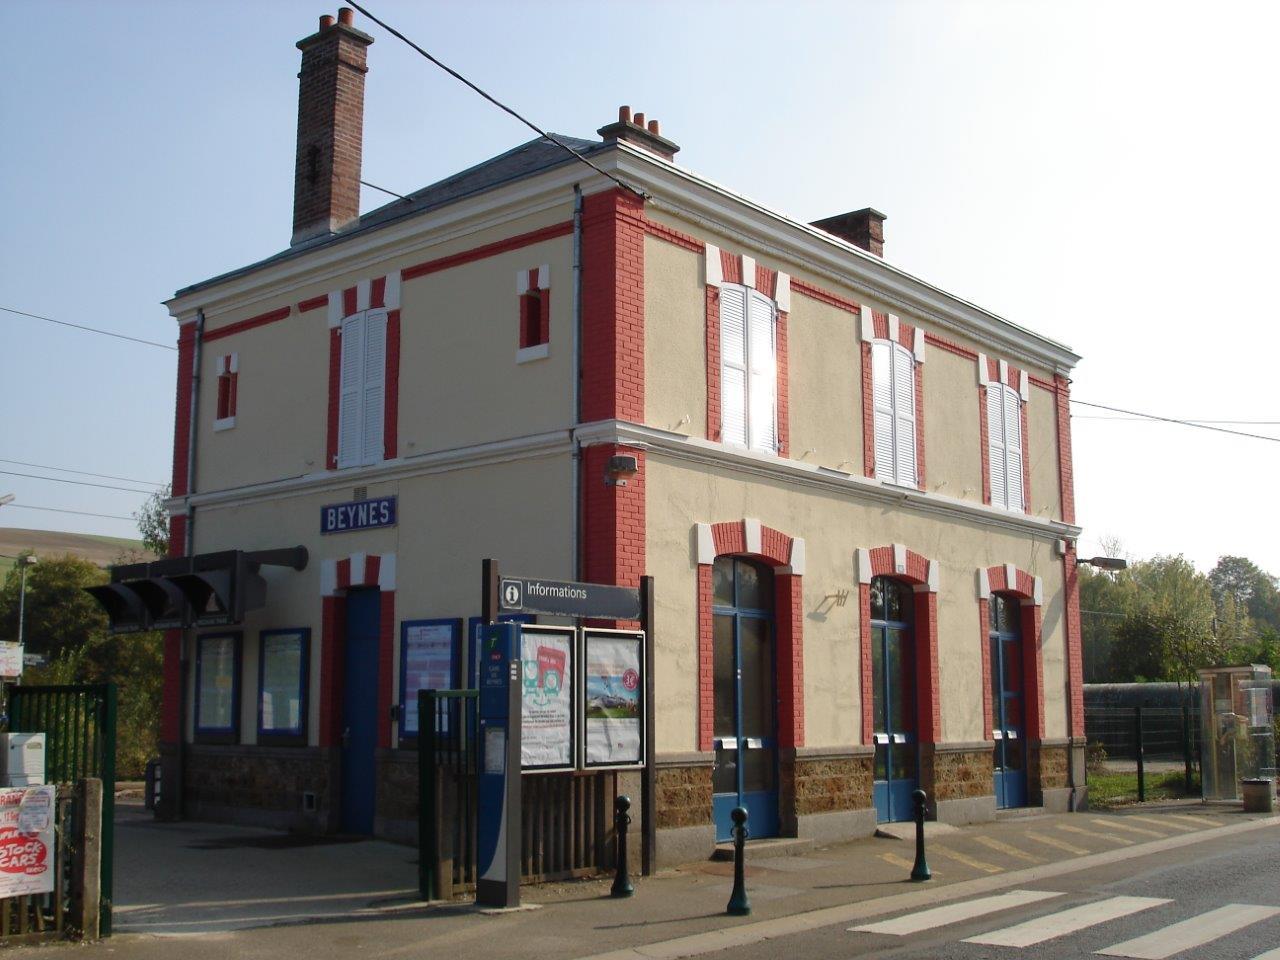 gare-de-beynes-train-station